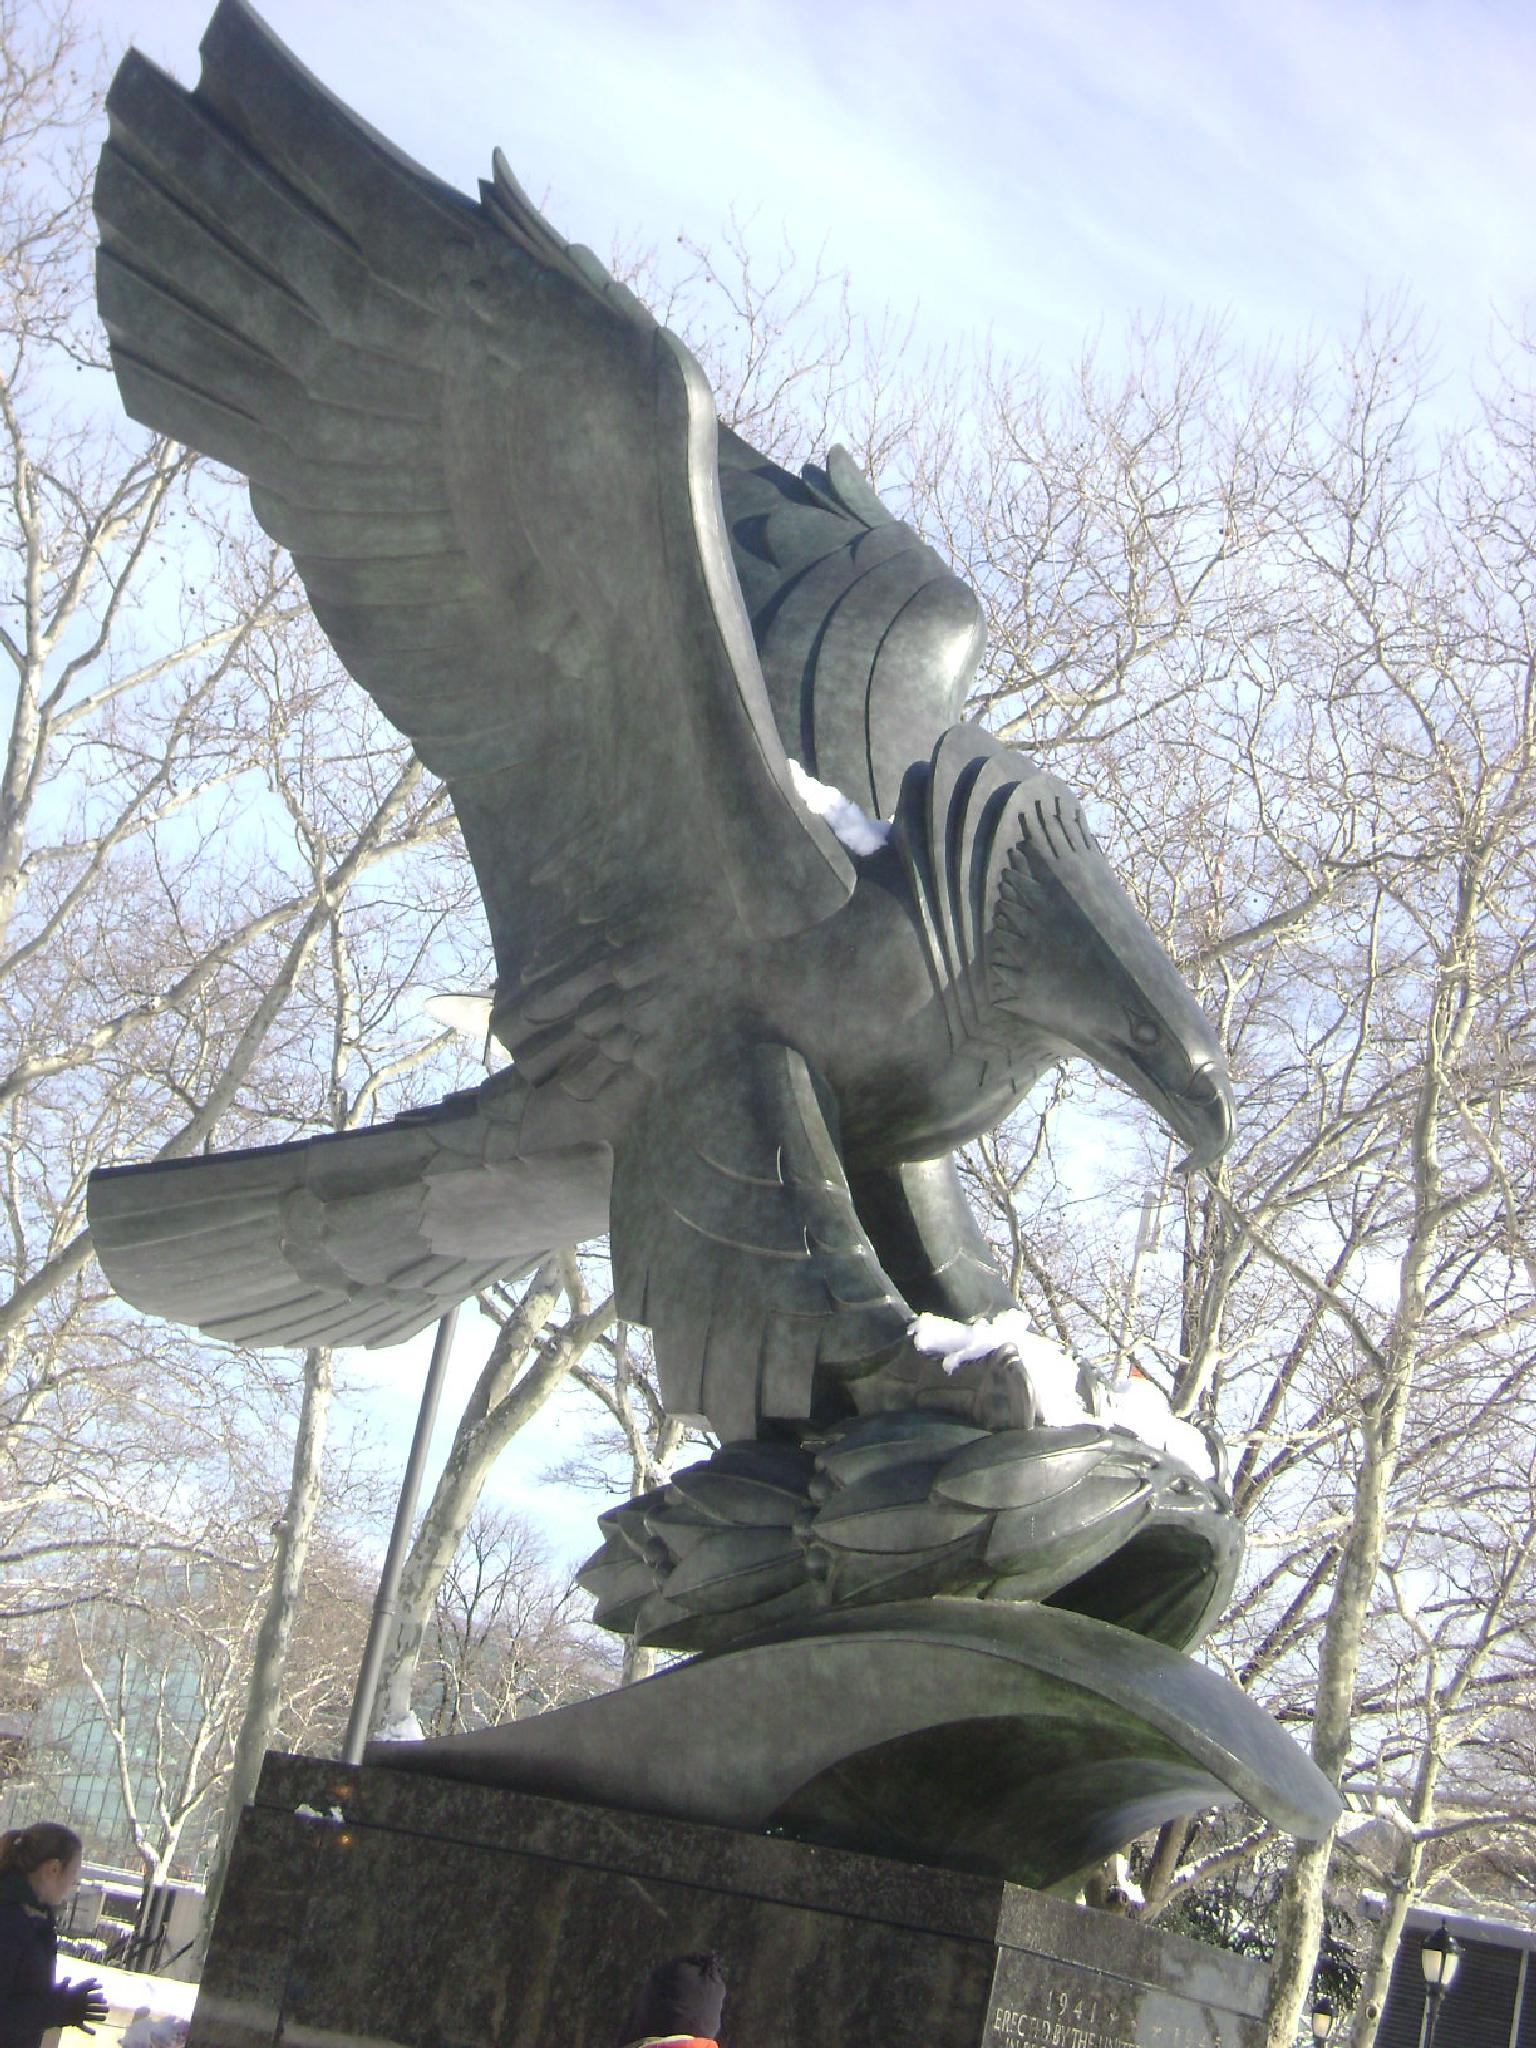 Memorial Eagle by Diana Marenfeld